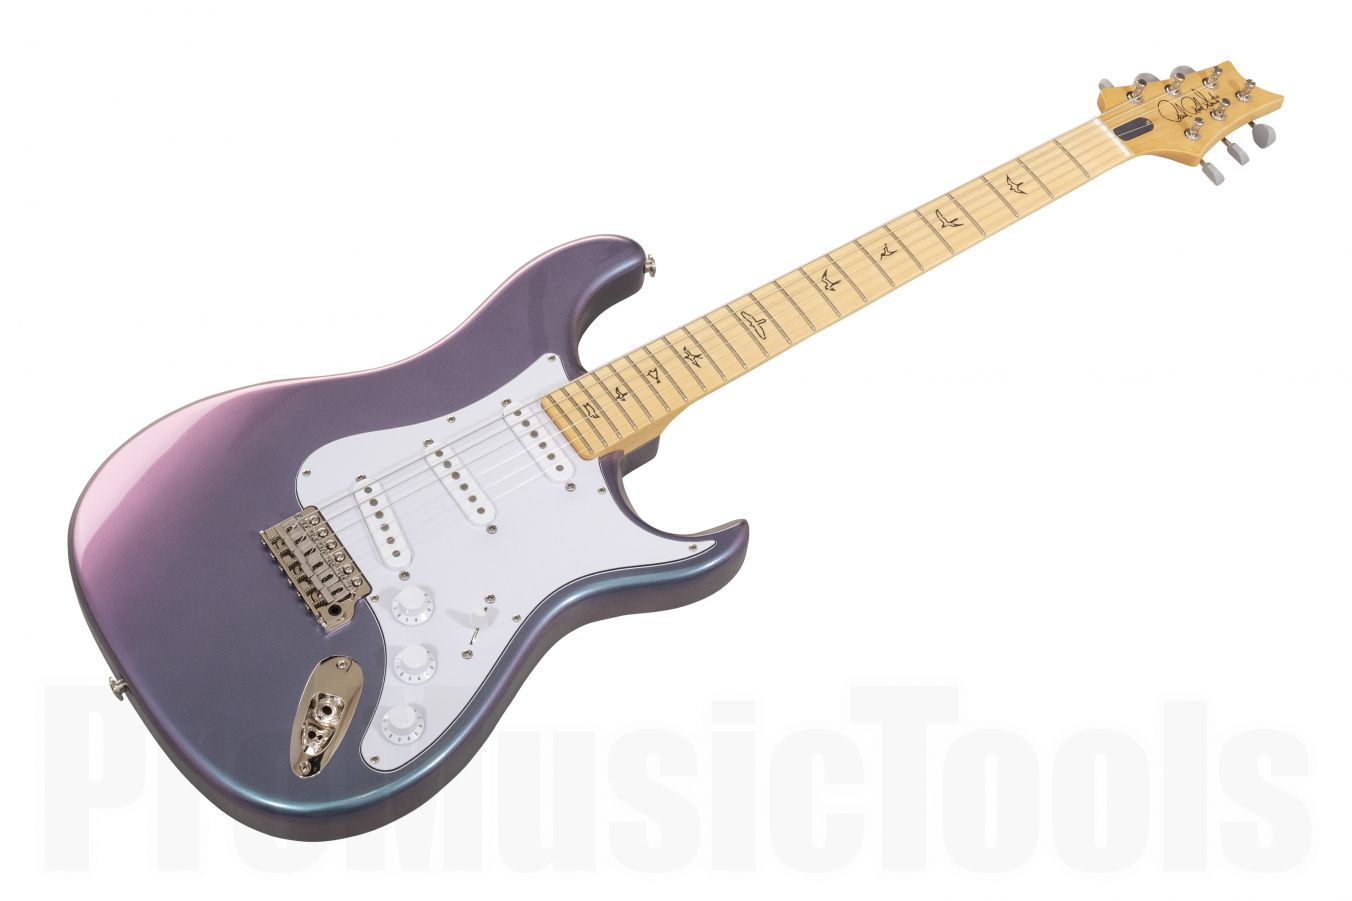 PRS USA Silver Sky John Mayer Signature - Lunar Ice Limited Edition